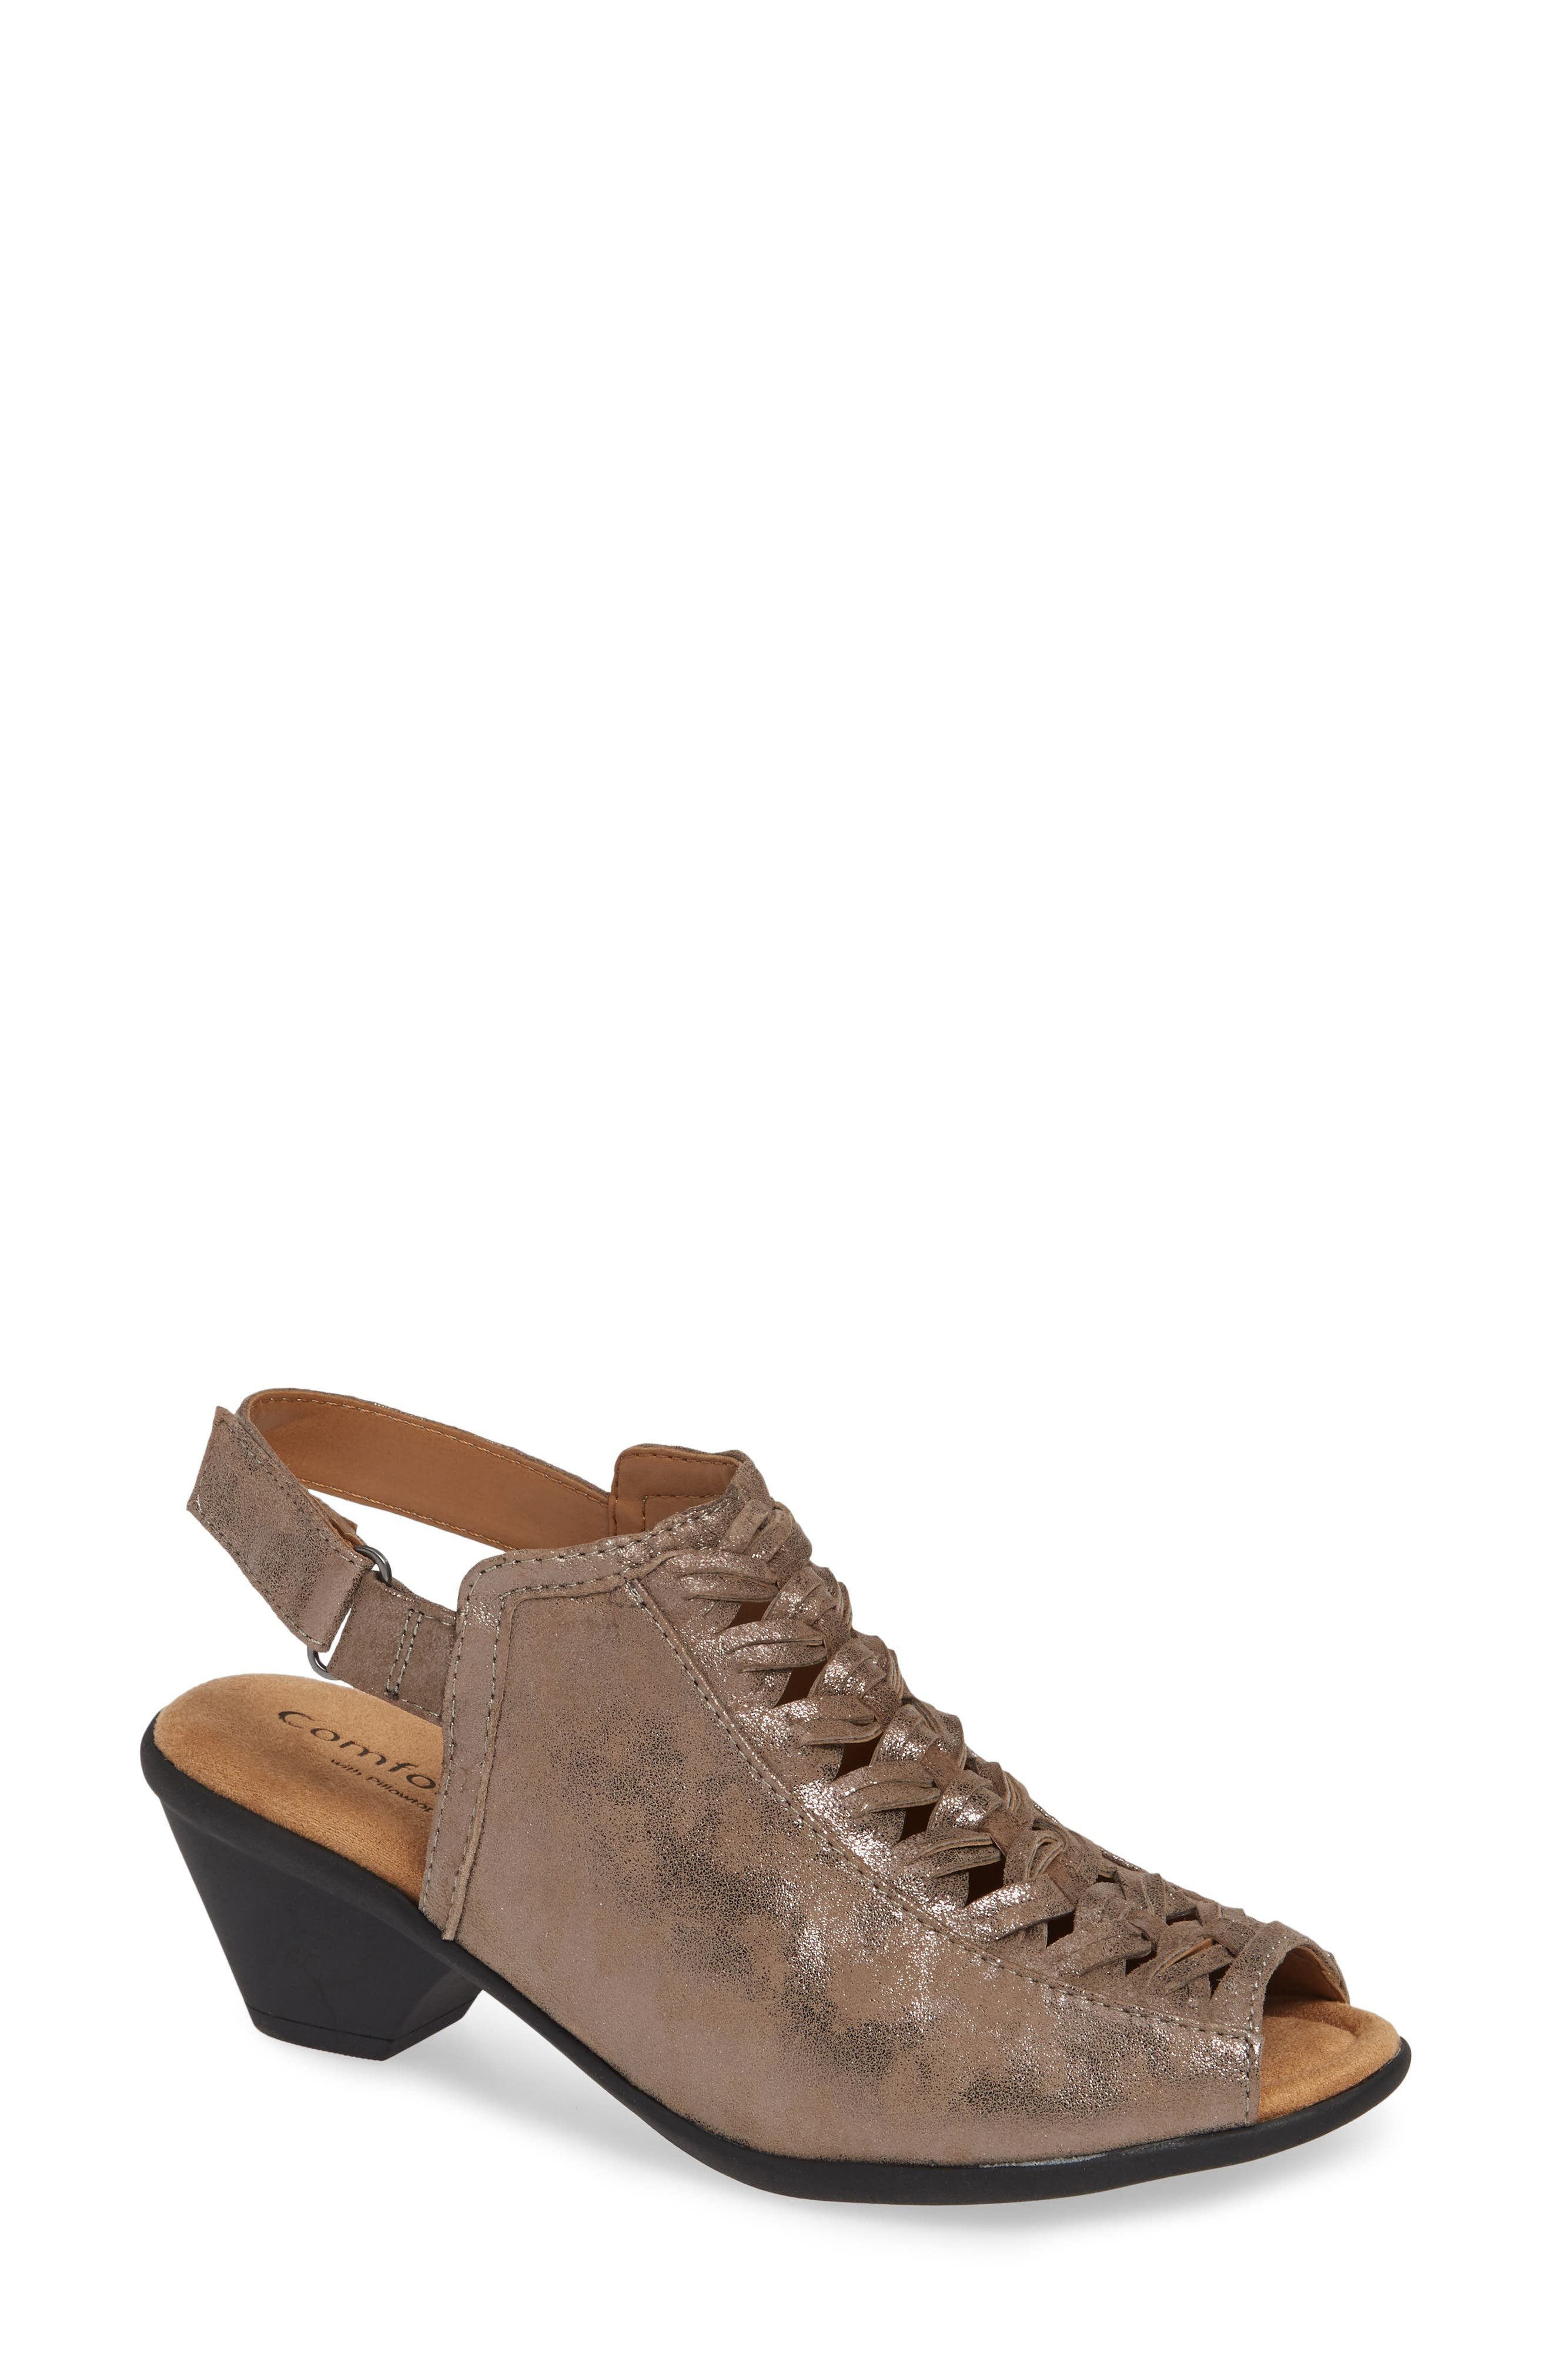 Comfortiva Finella Leather Sandal, Grey